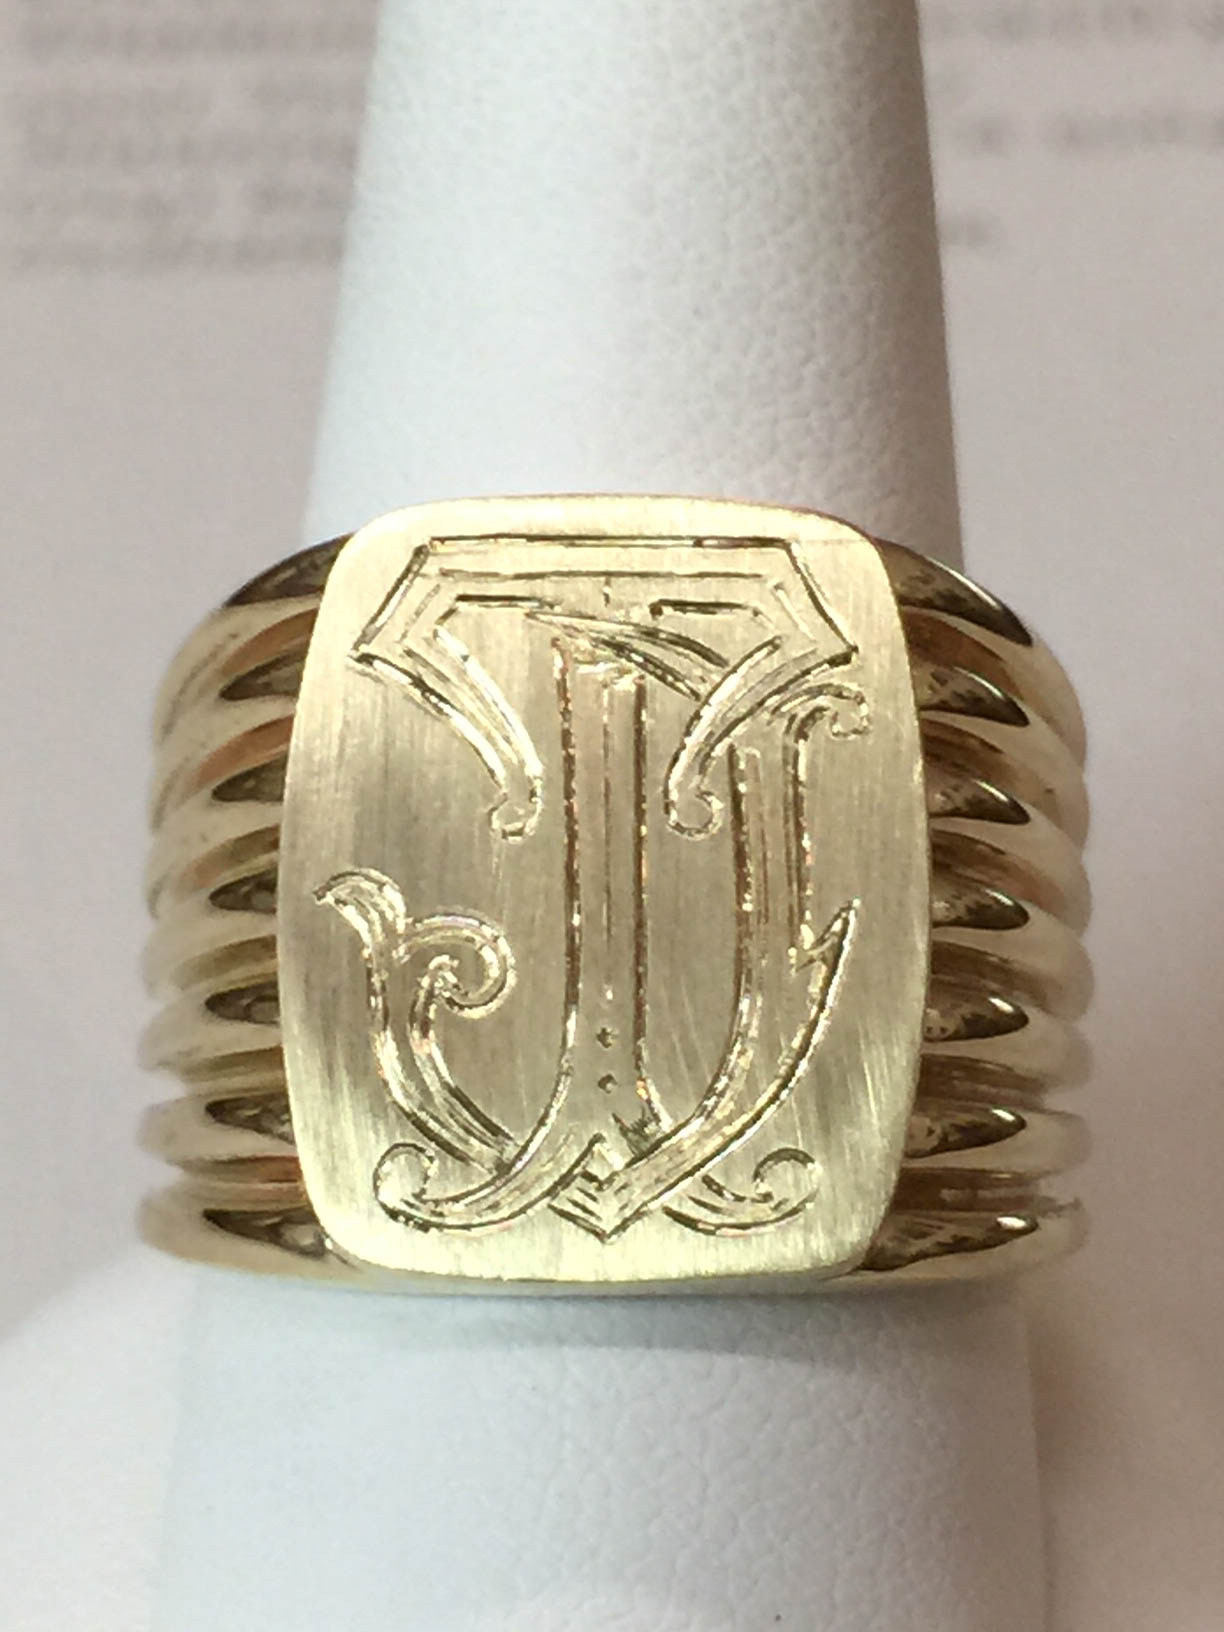 Copy of Monogram Ring, 18kt Gold